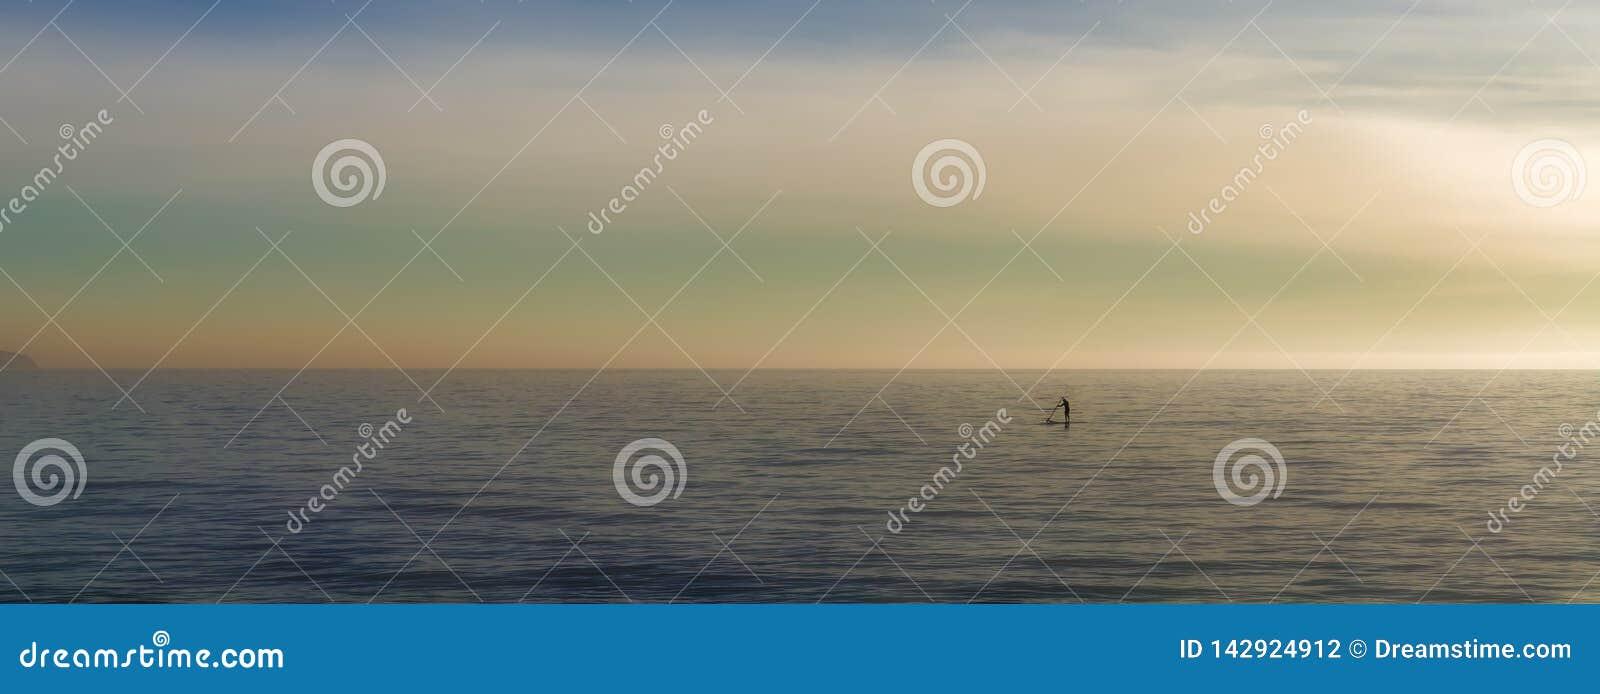 Paddleboarding på det öppna havet solo, watersports med härlig landskapbakgrund, palma, mallorca, Spanien